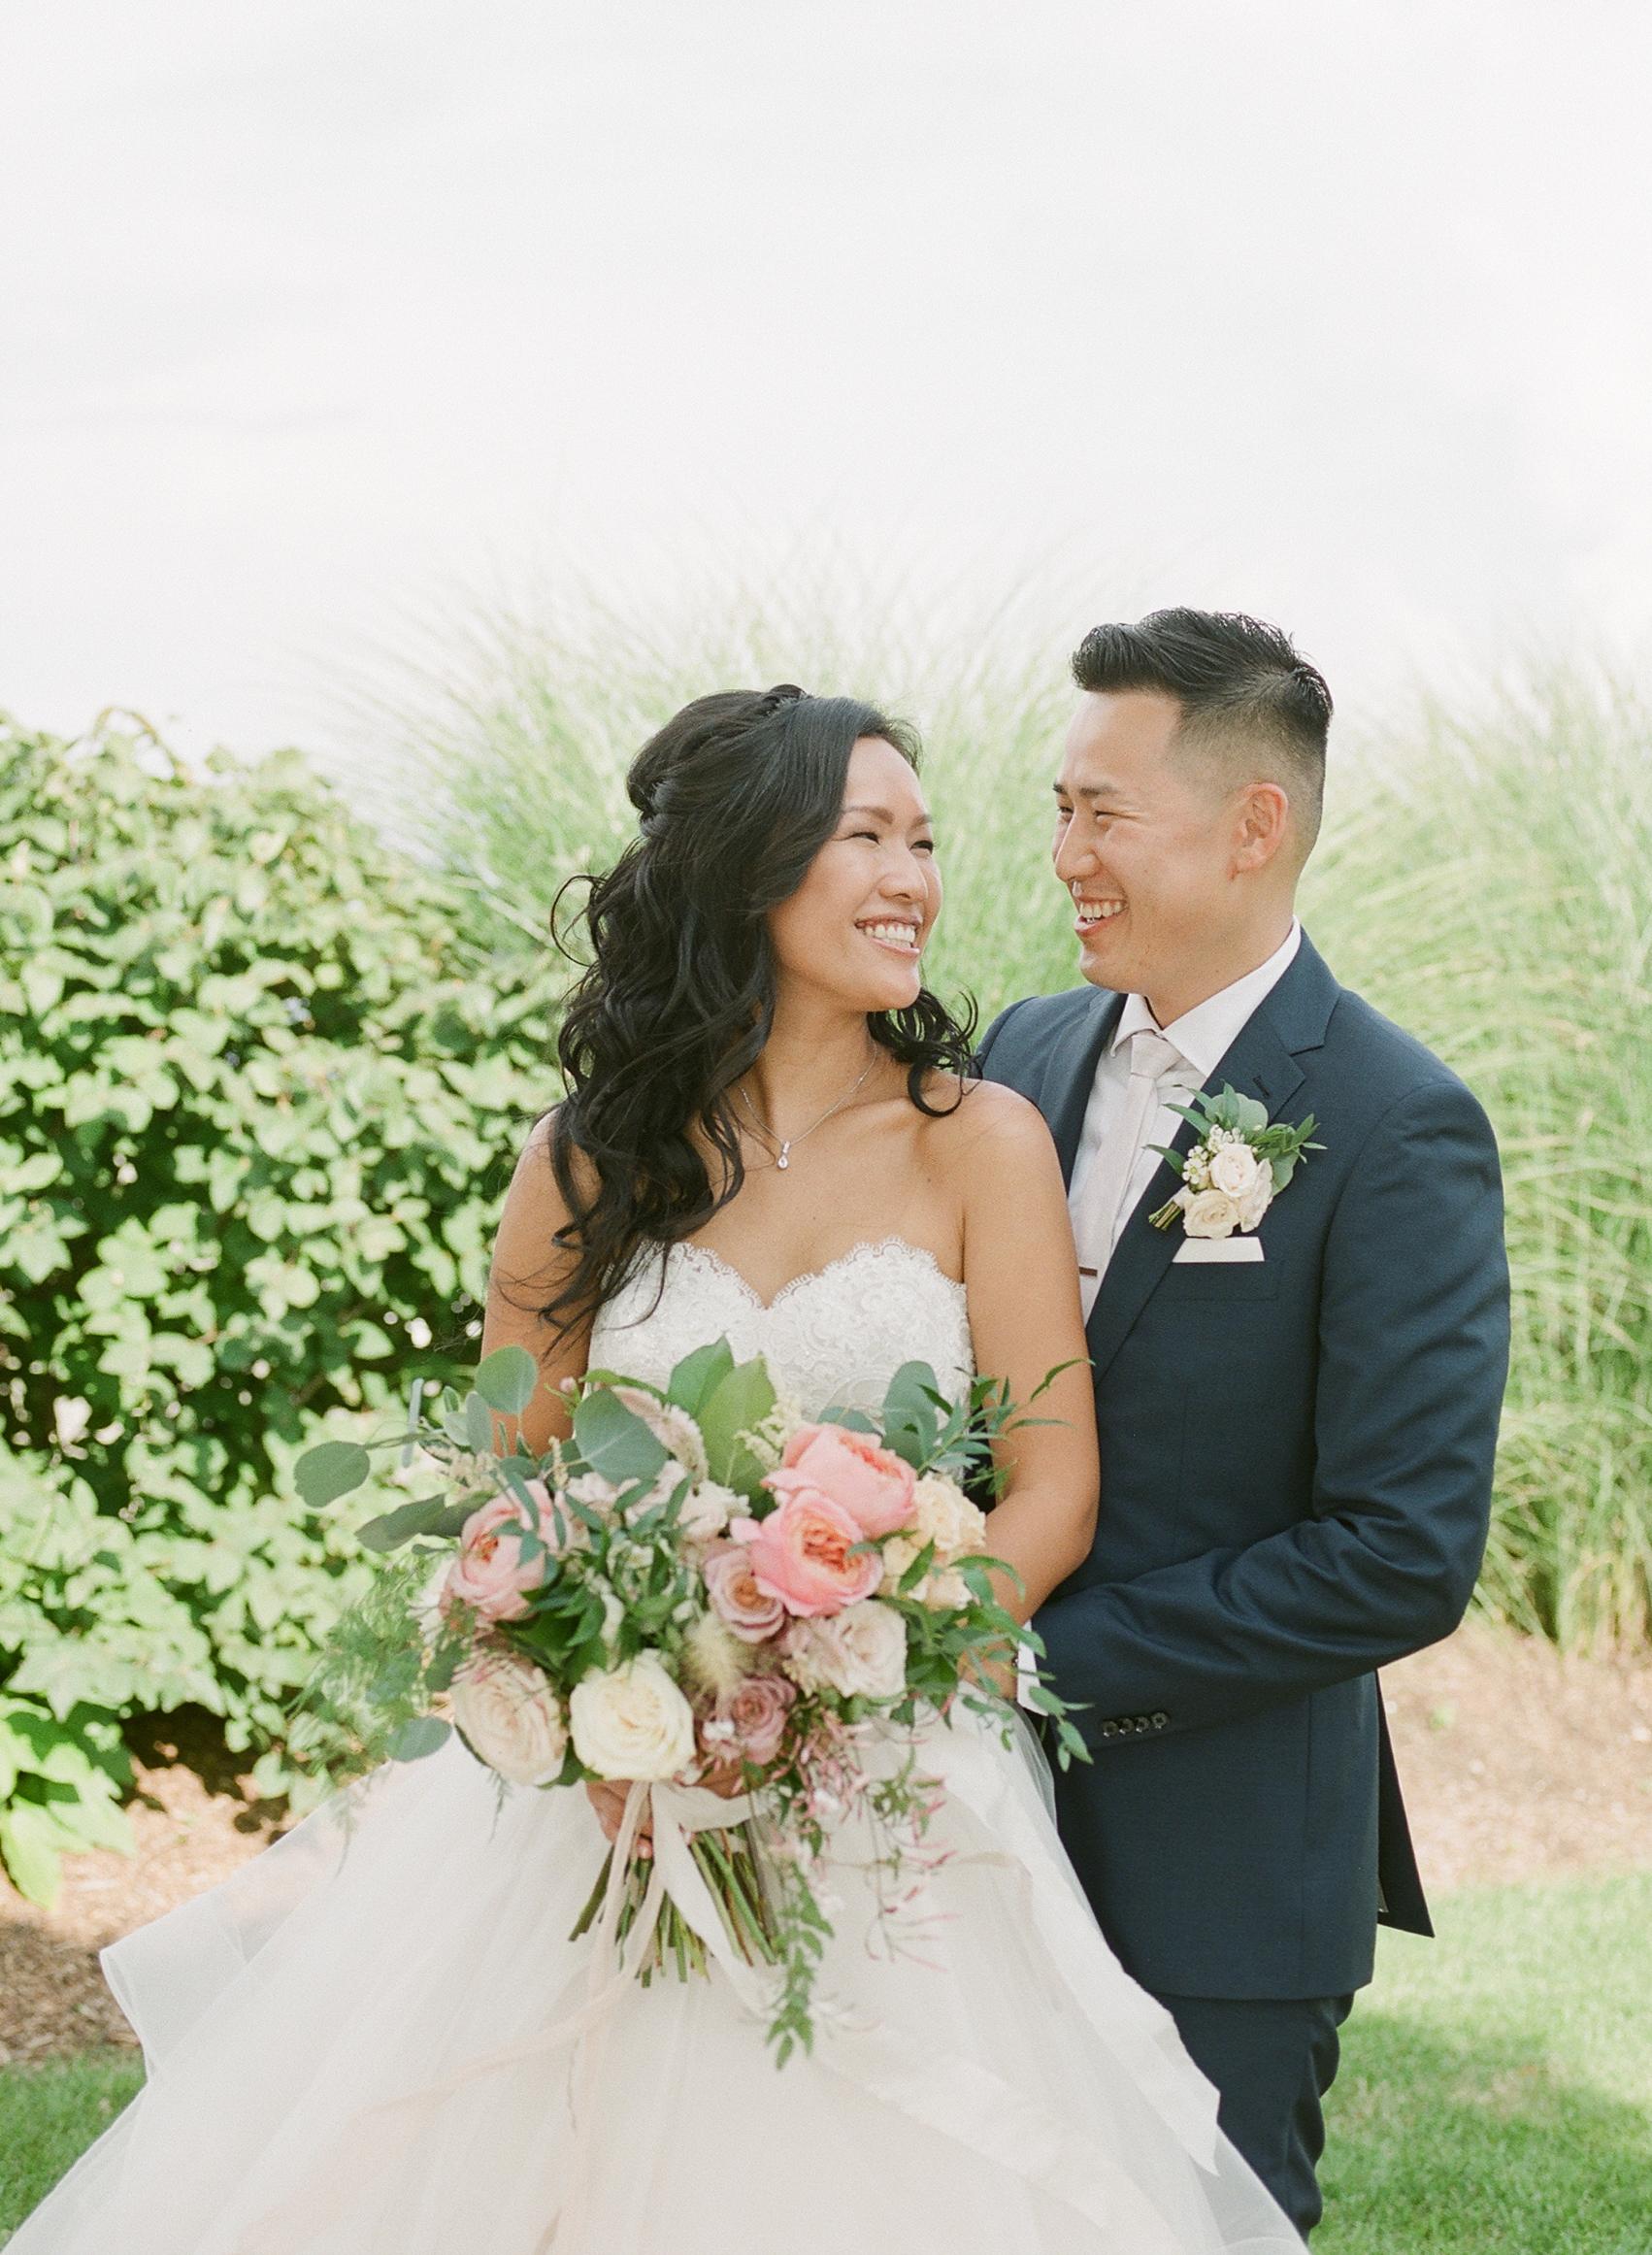 Greentree Country Club Wedding-3.jpg